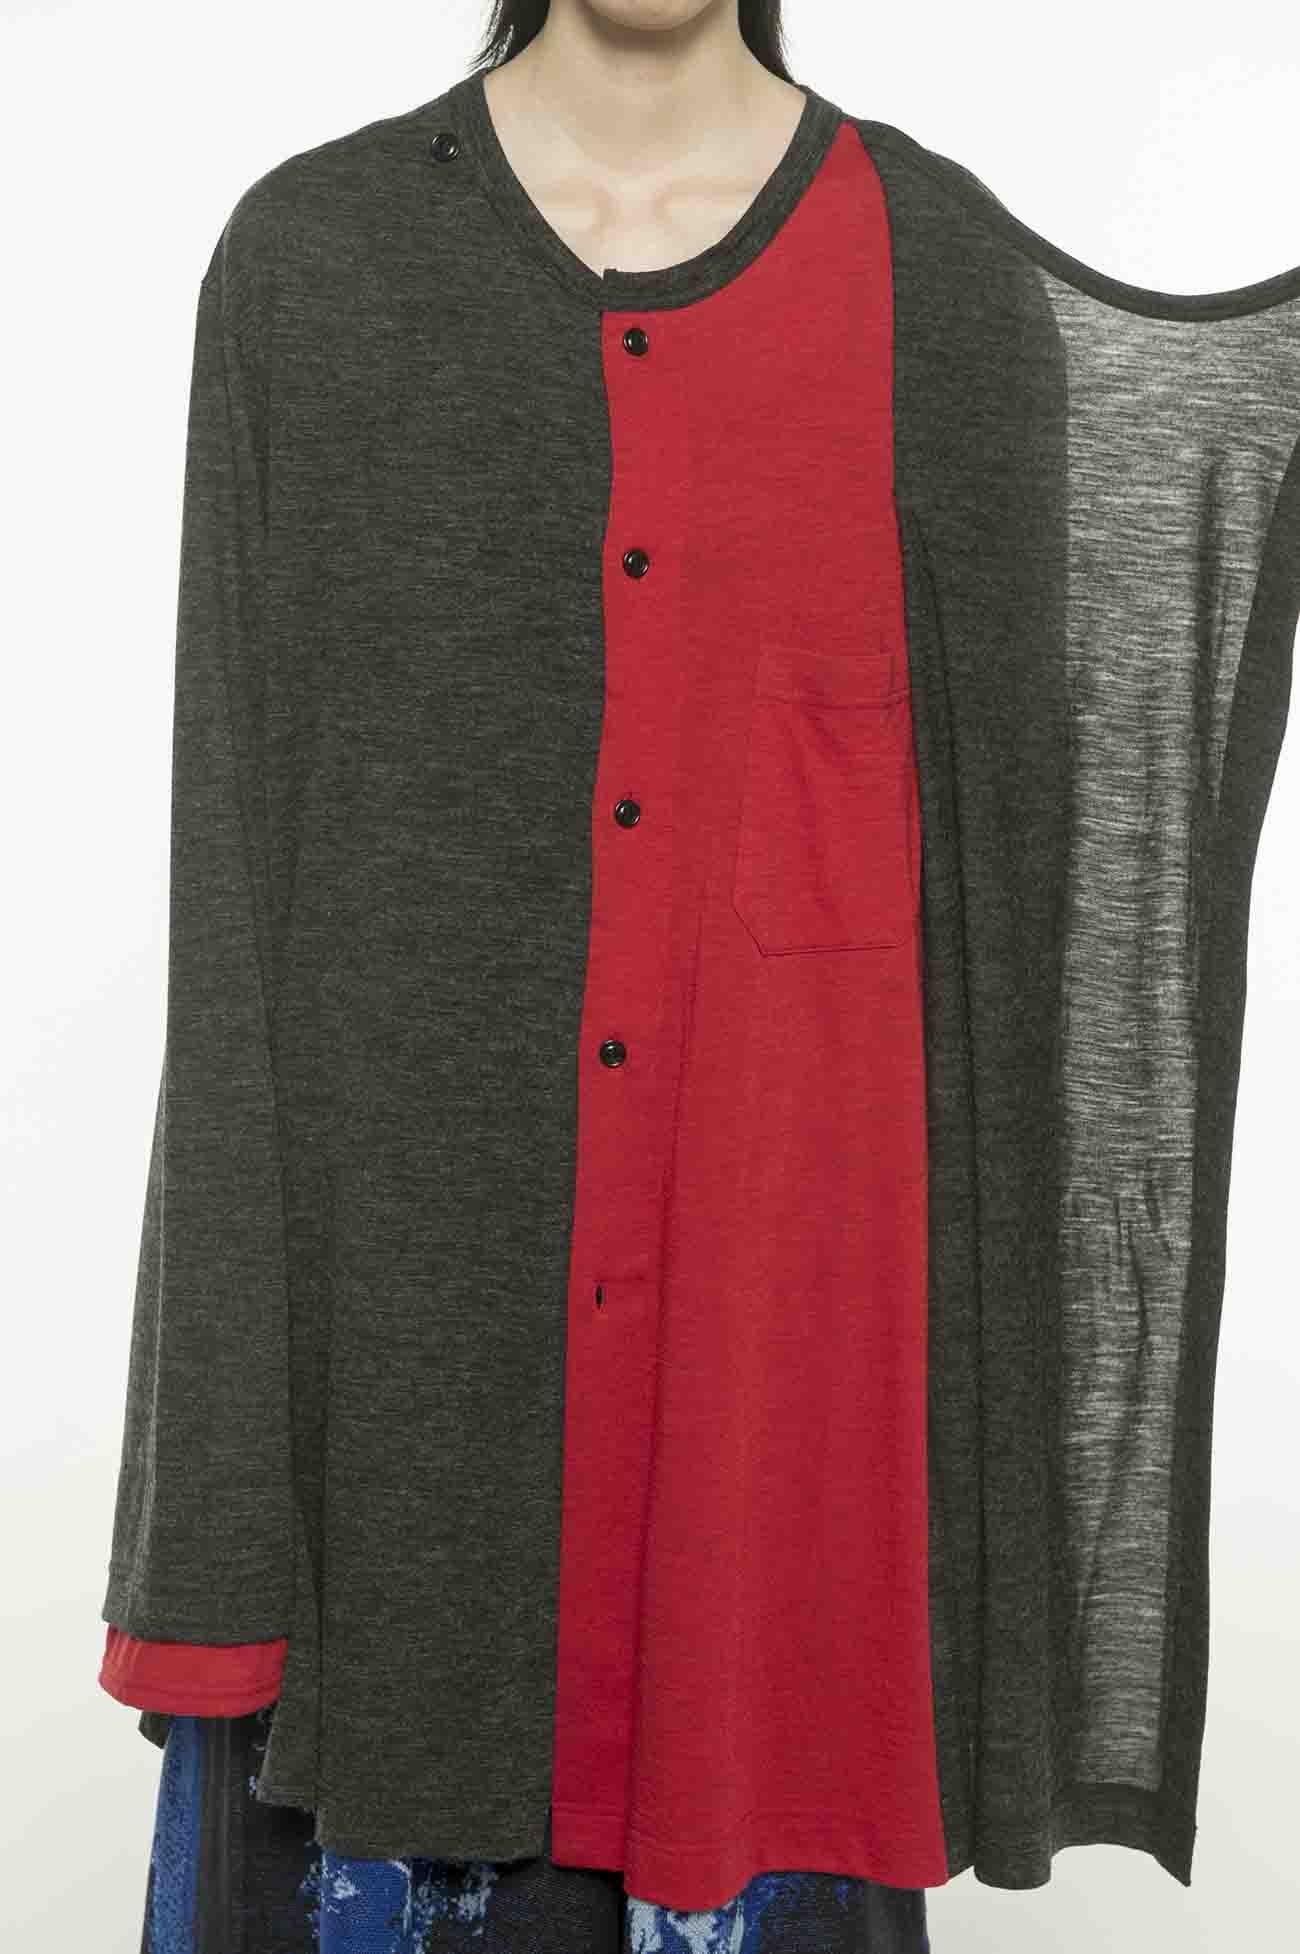 Wool Acrylic Jersey Panel Color Wrap Crew Cardigan